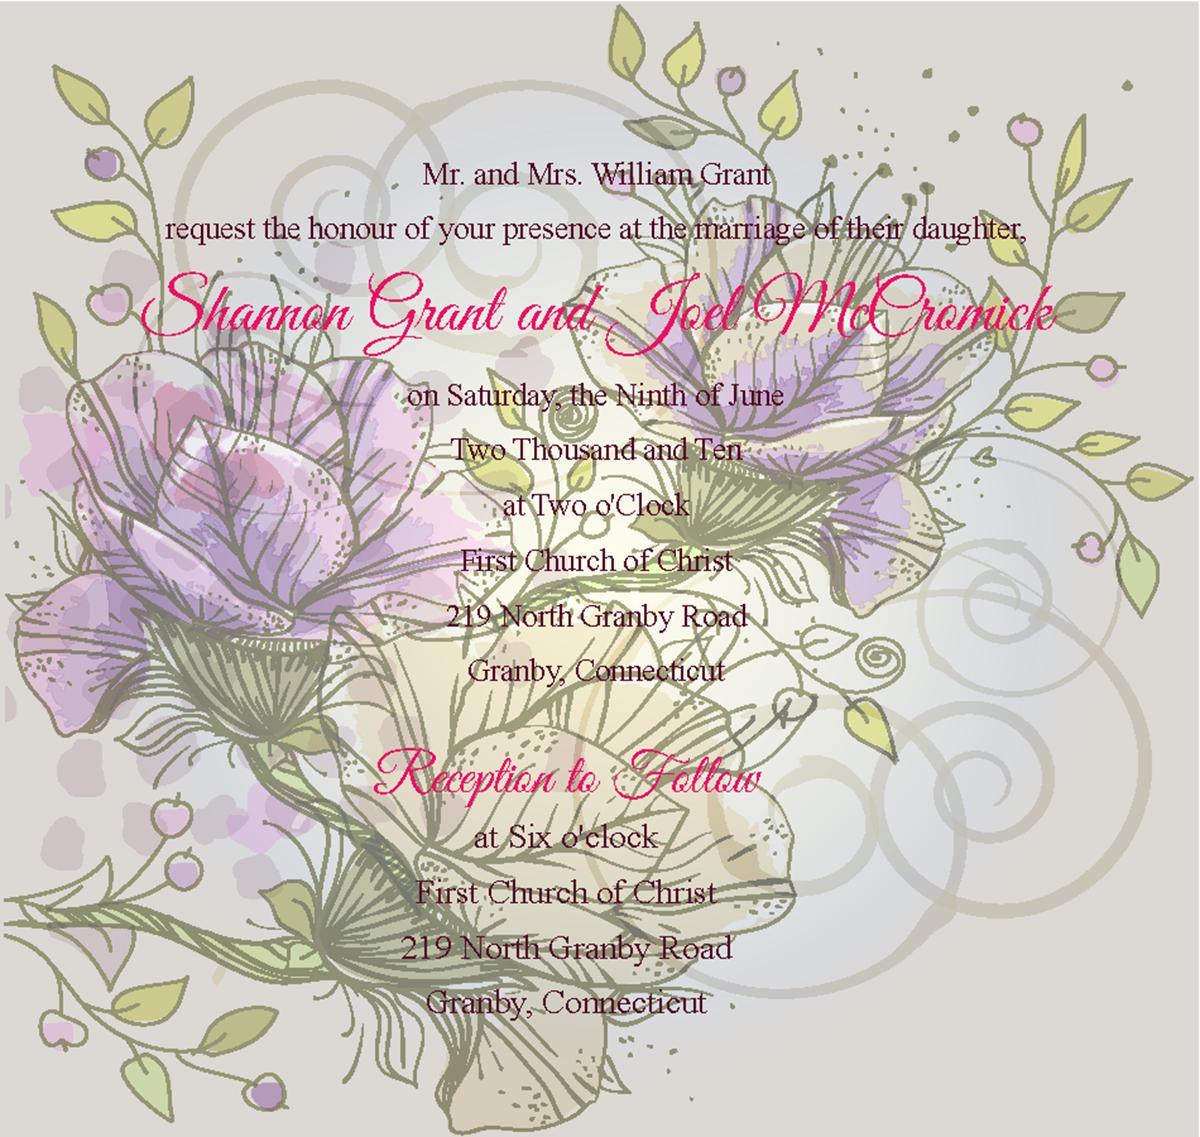 wedding invitation design for the ribbon company by With the wedding invitation design company